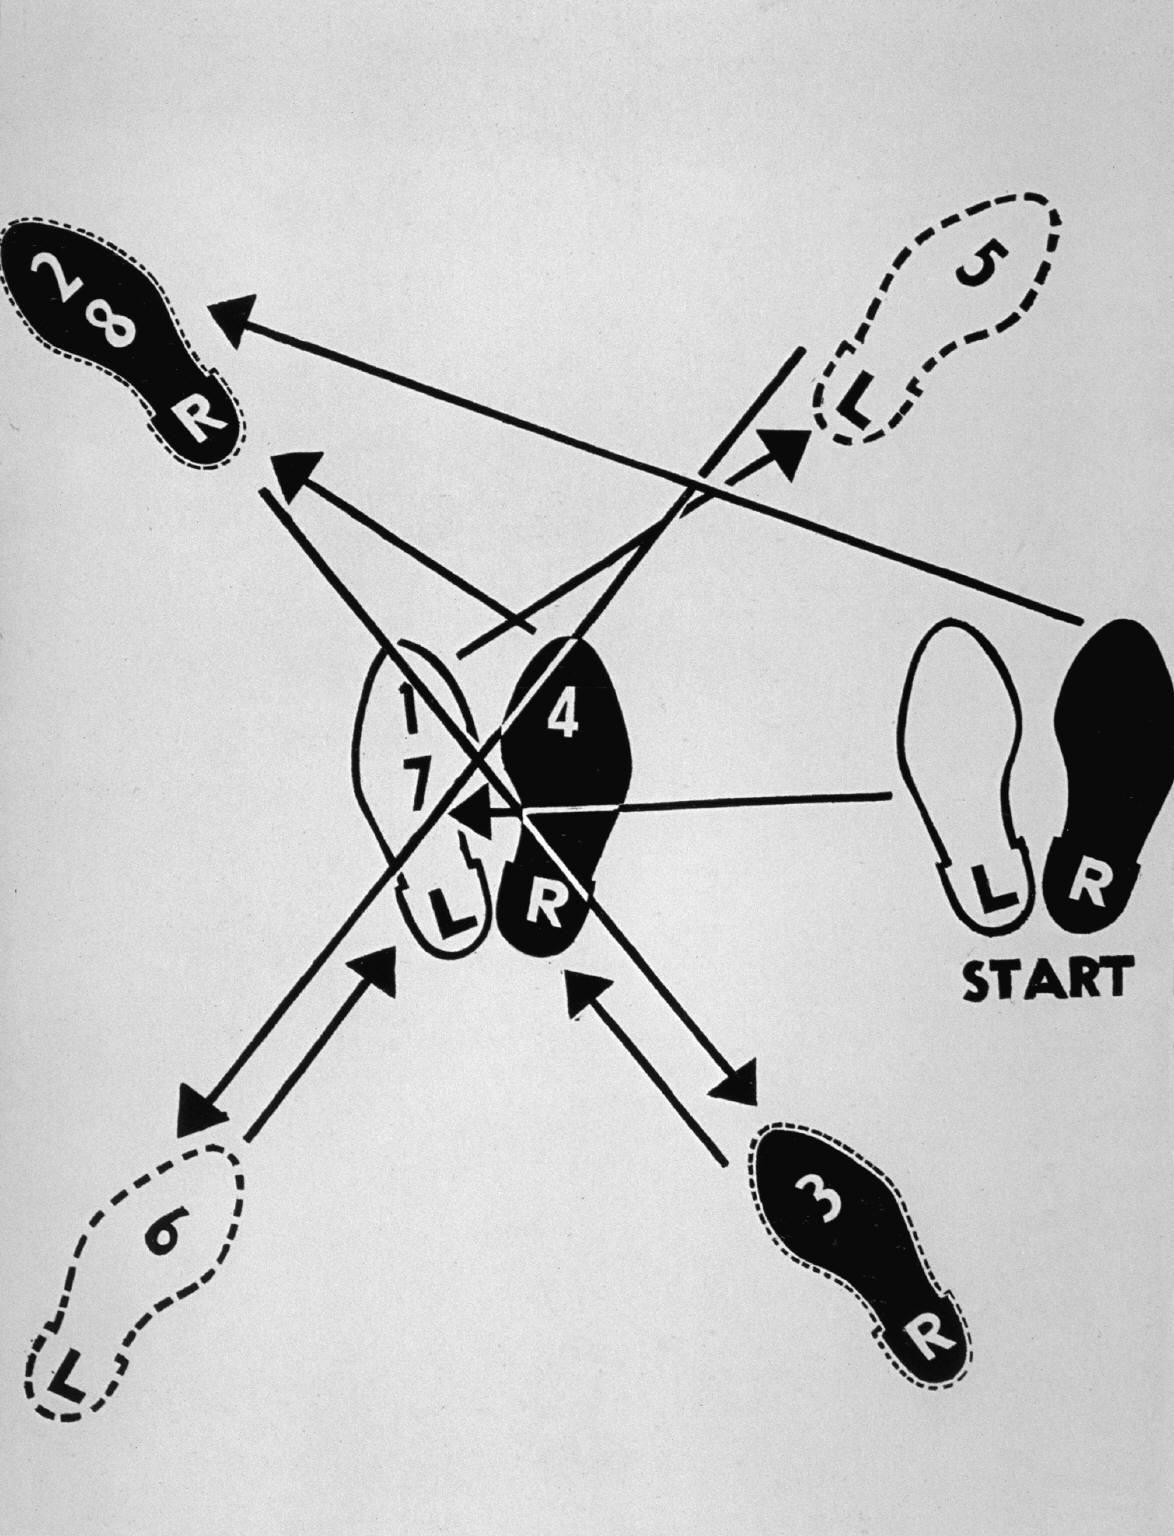 medium resolution of dance diagram for the charleston andy warhol